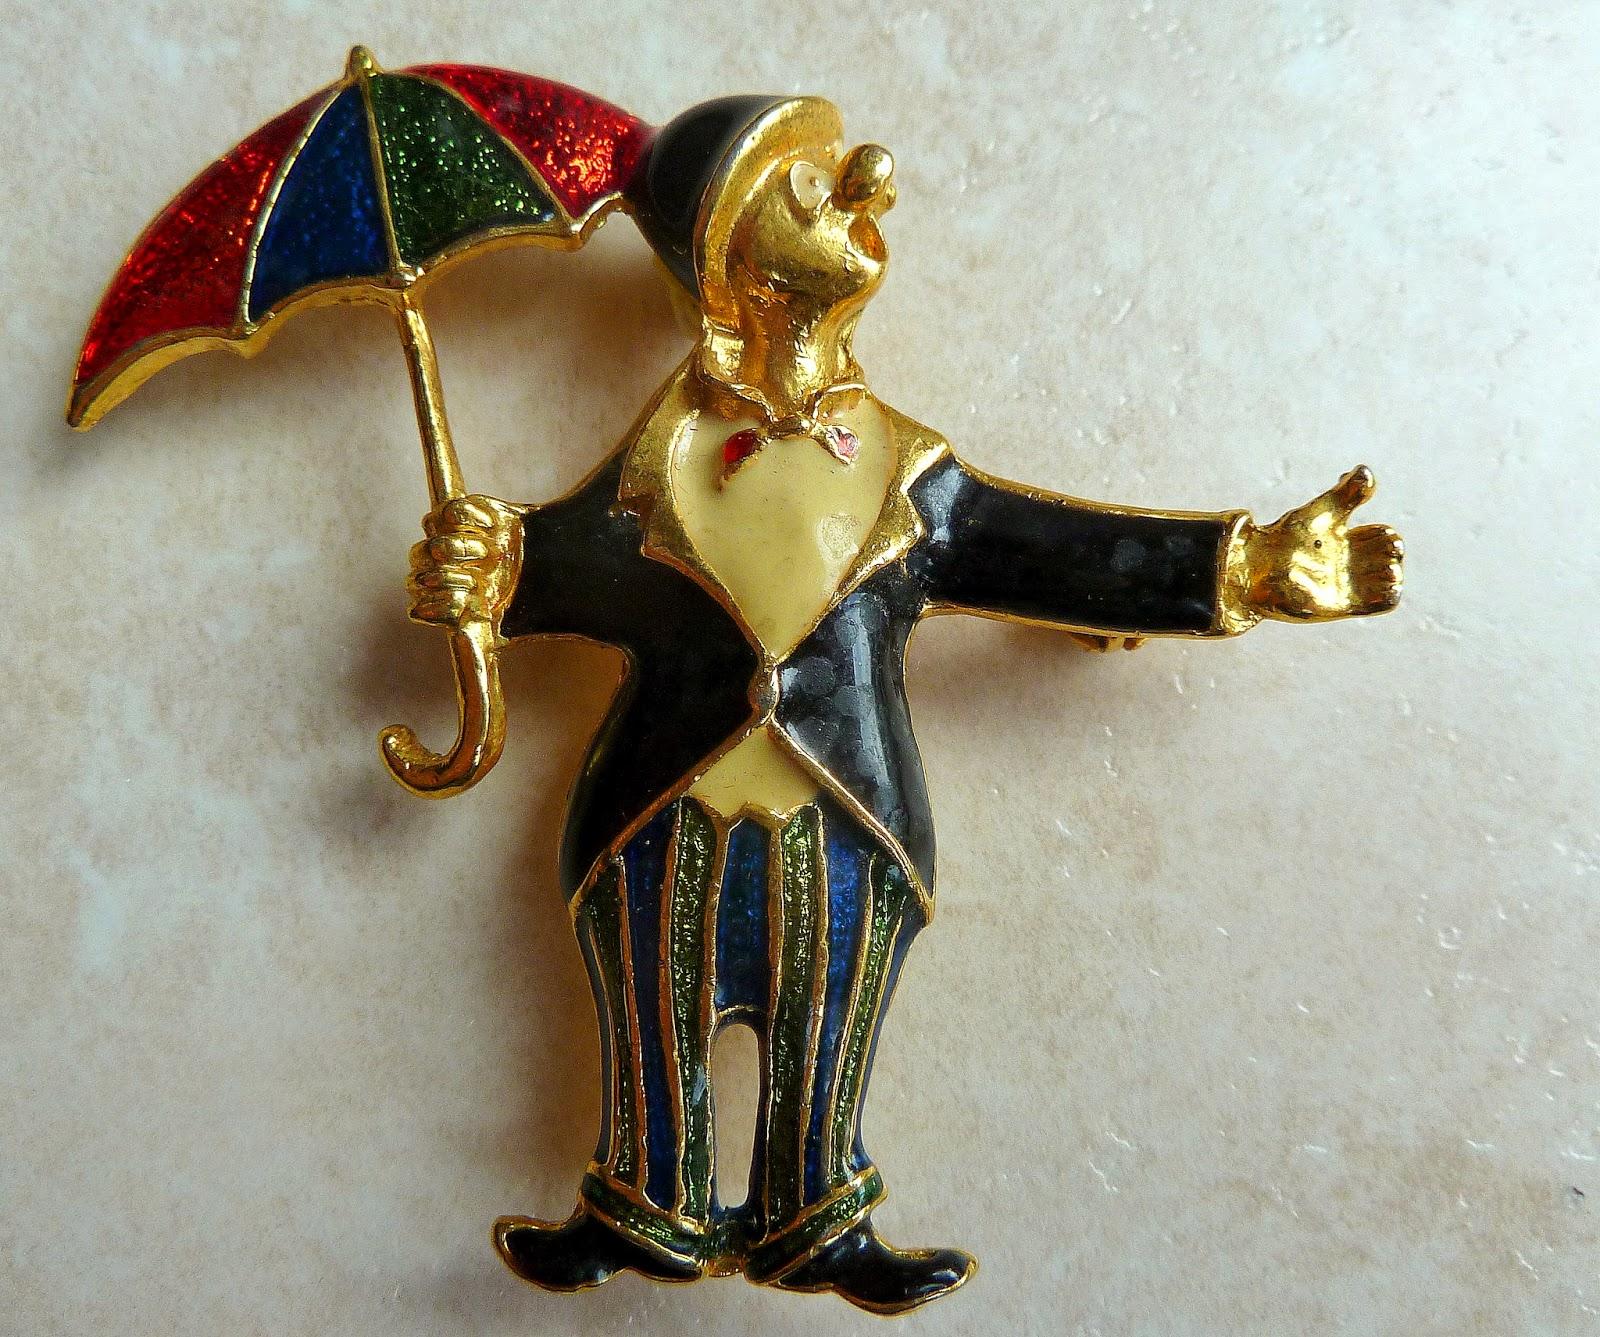 http://www.kcavintagegems.uk/vintage-clown-in-the-rain-brooch-132-p.asp